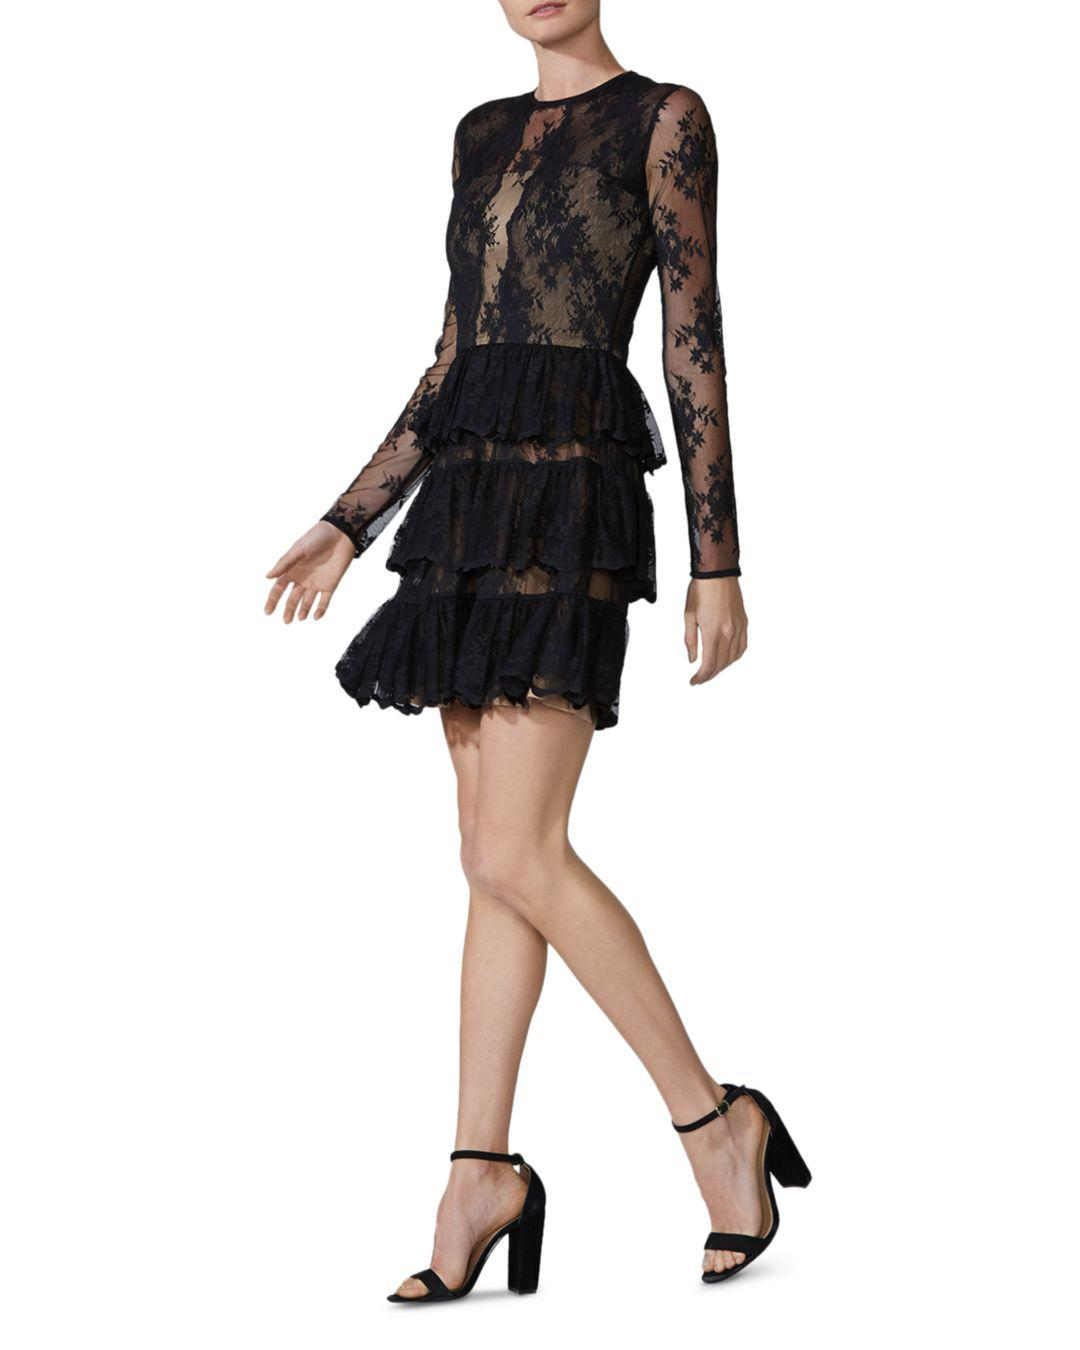 Riviera Lace Tiered Dress